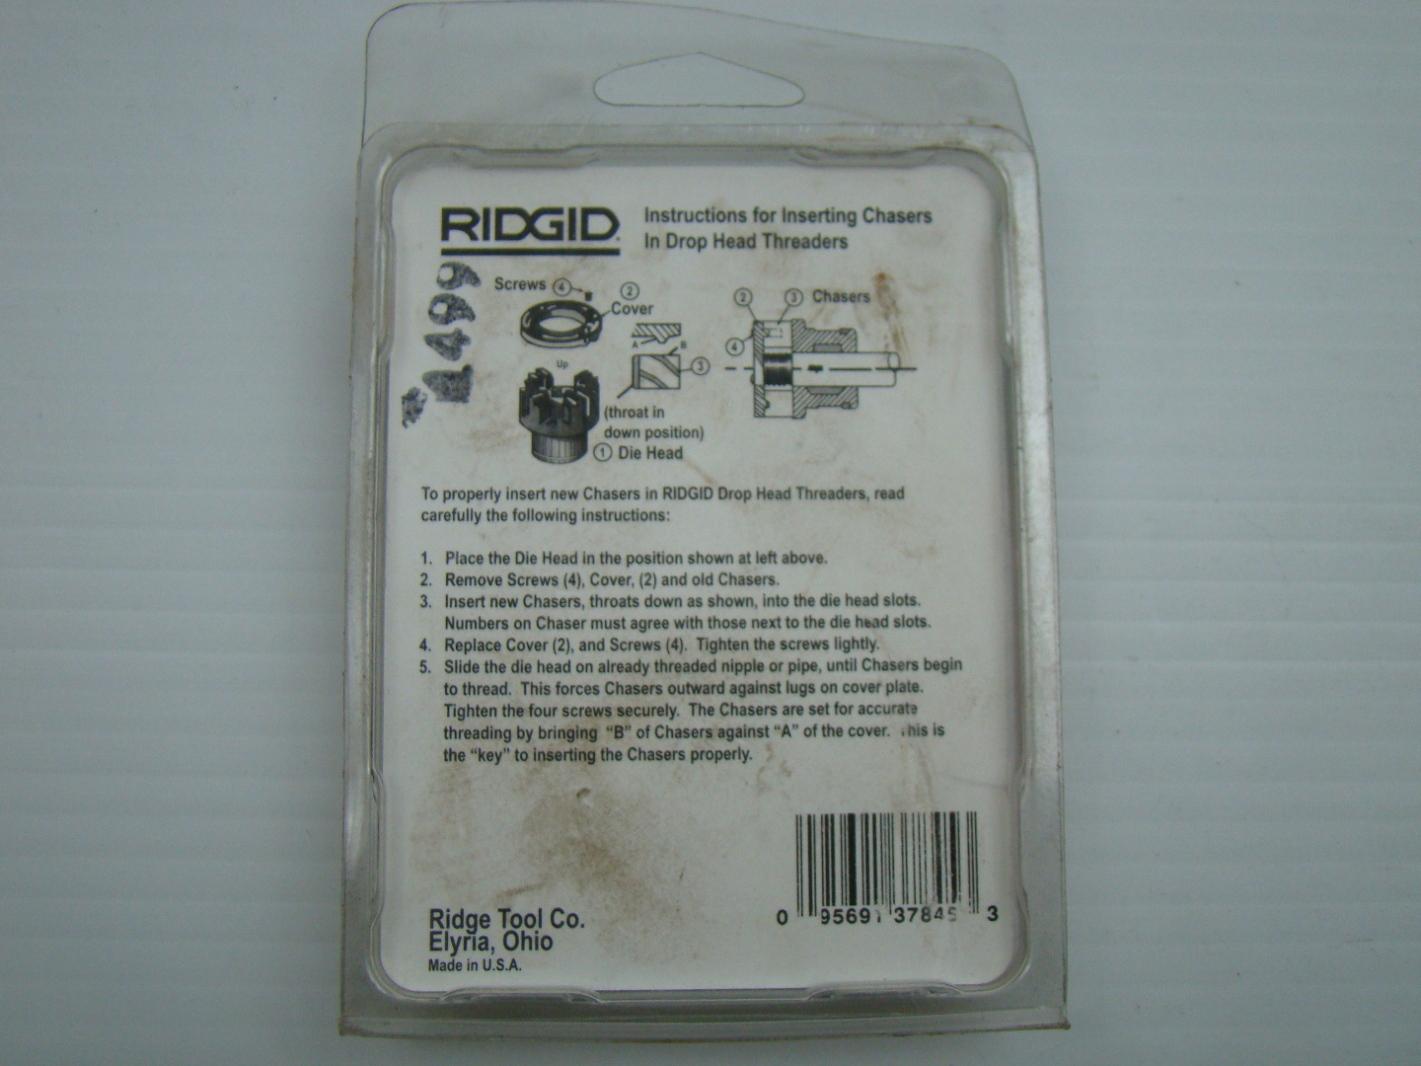 Ridgid 1 2 Alloy Pipe Dies 11 Tpi Rh Ebay 12r Npt Threader 37850